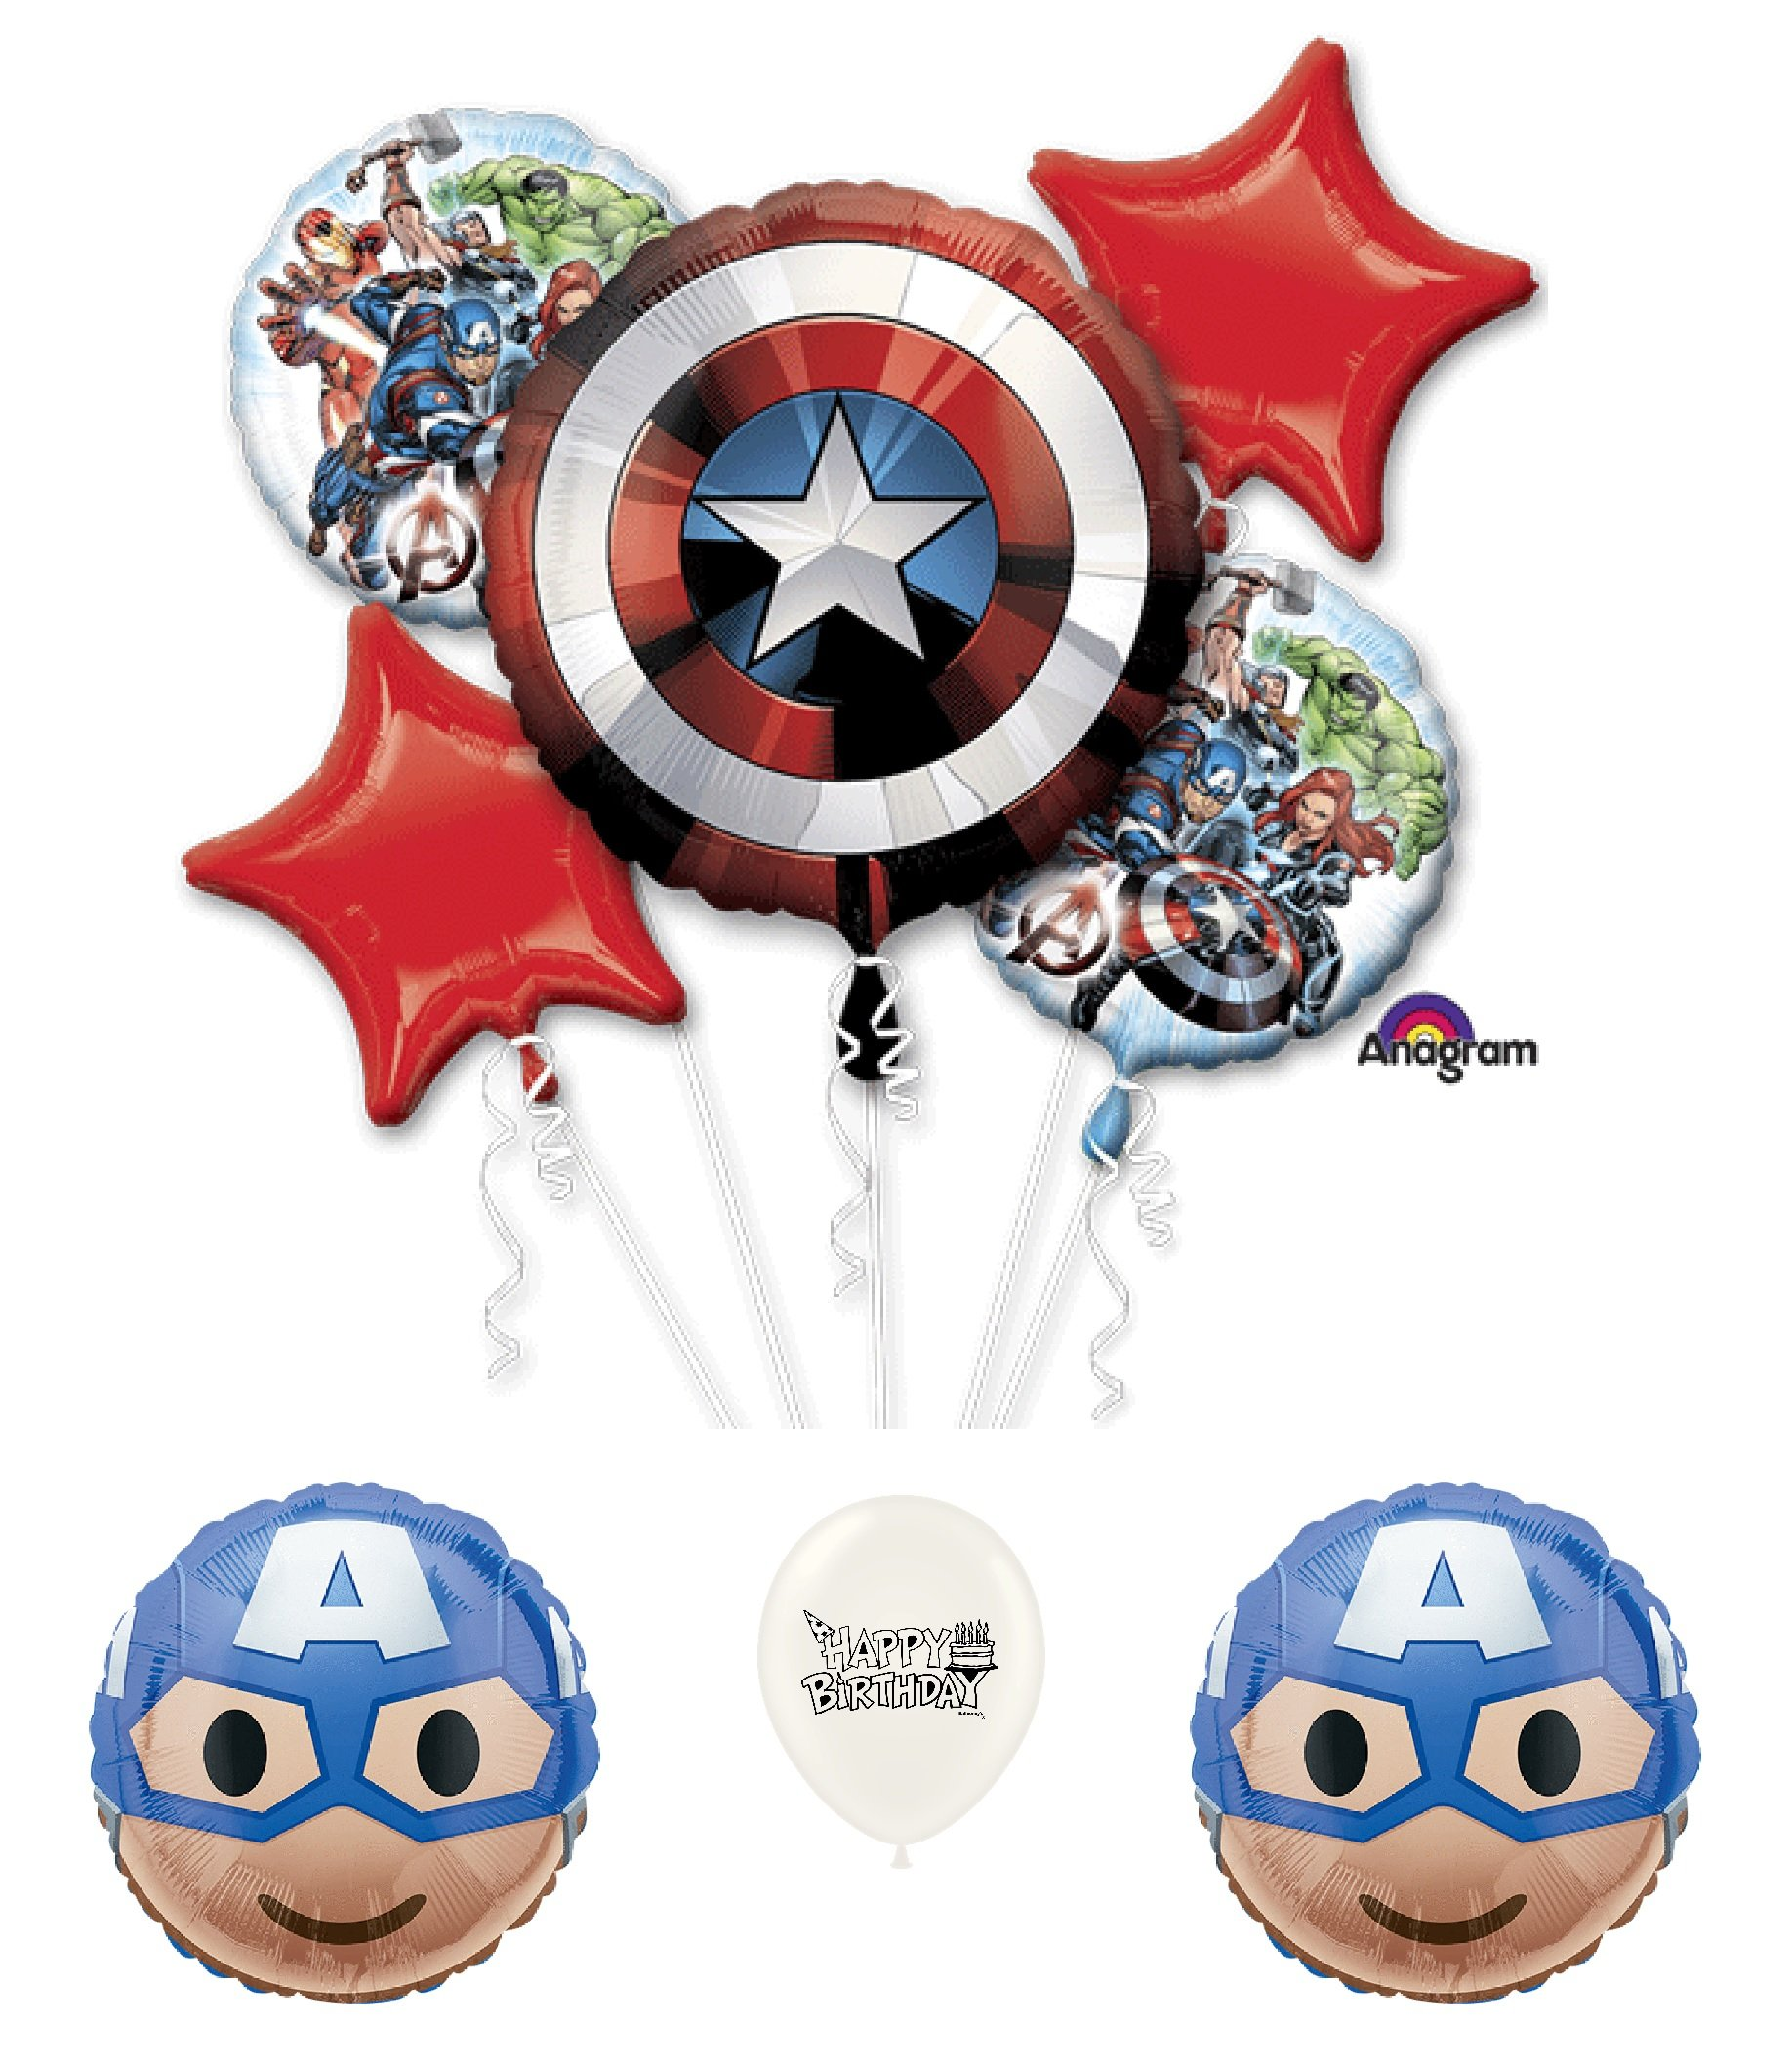 Avengers Captain America 8 piece Birthday Party Balloon Bouquet Bundle